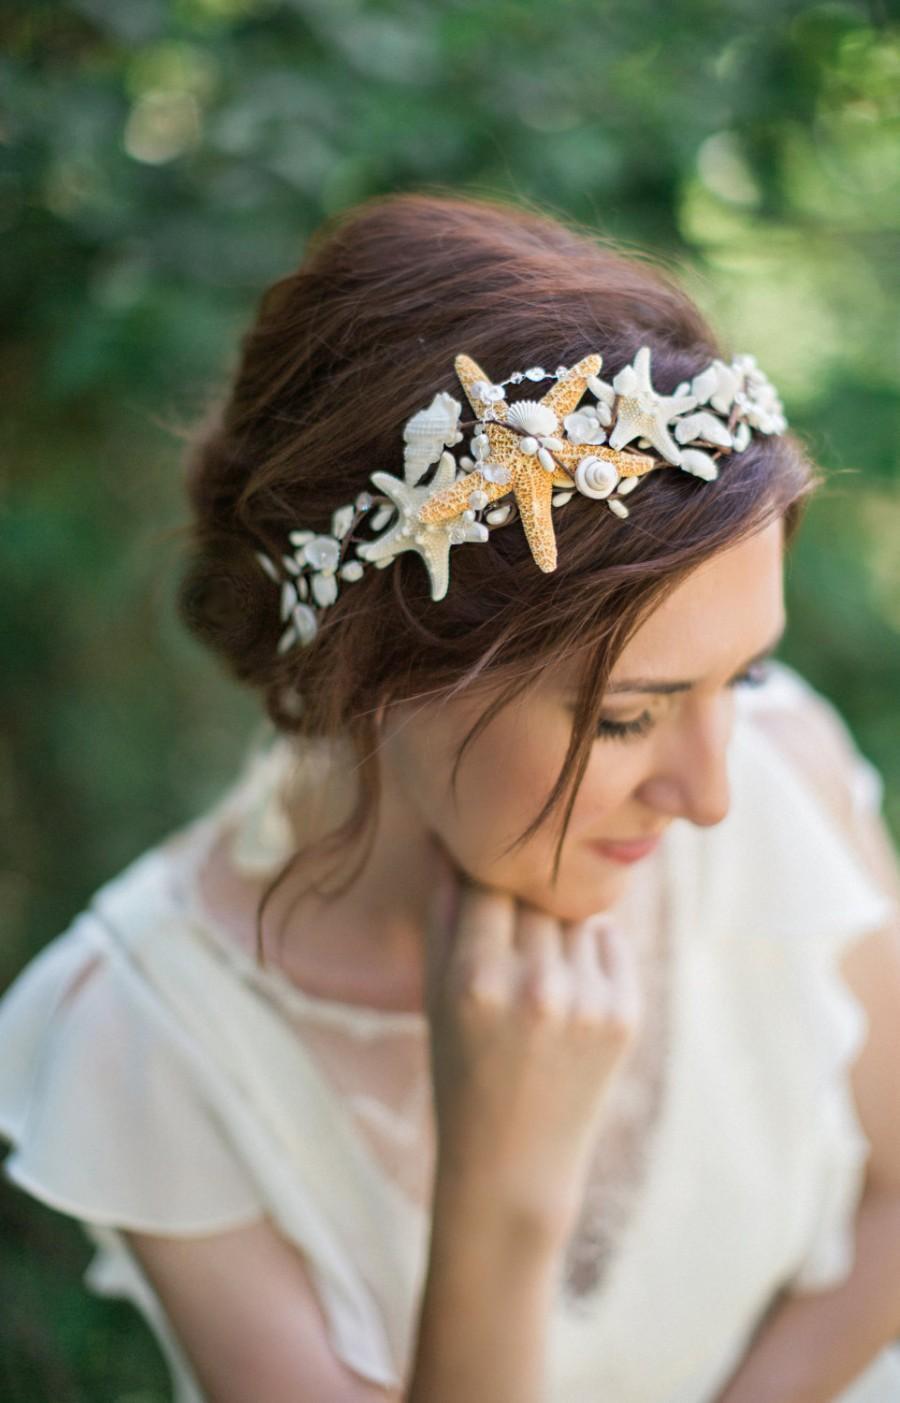 Seashell Headpiece Headband Hair Accessories Starfish Crown Piece Beach Wedding 9